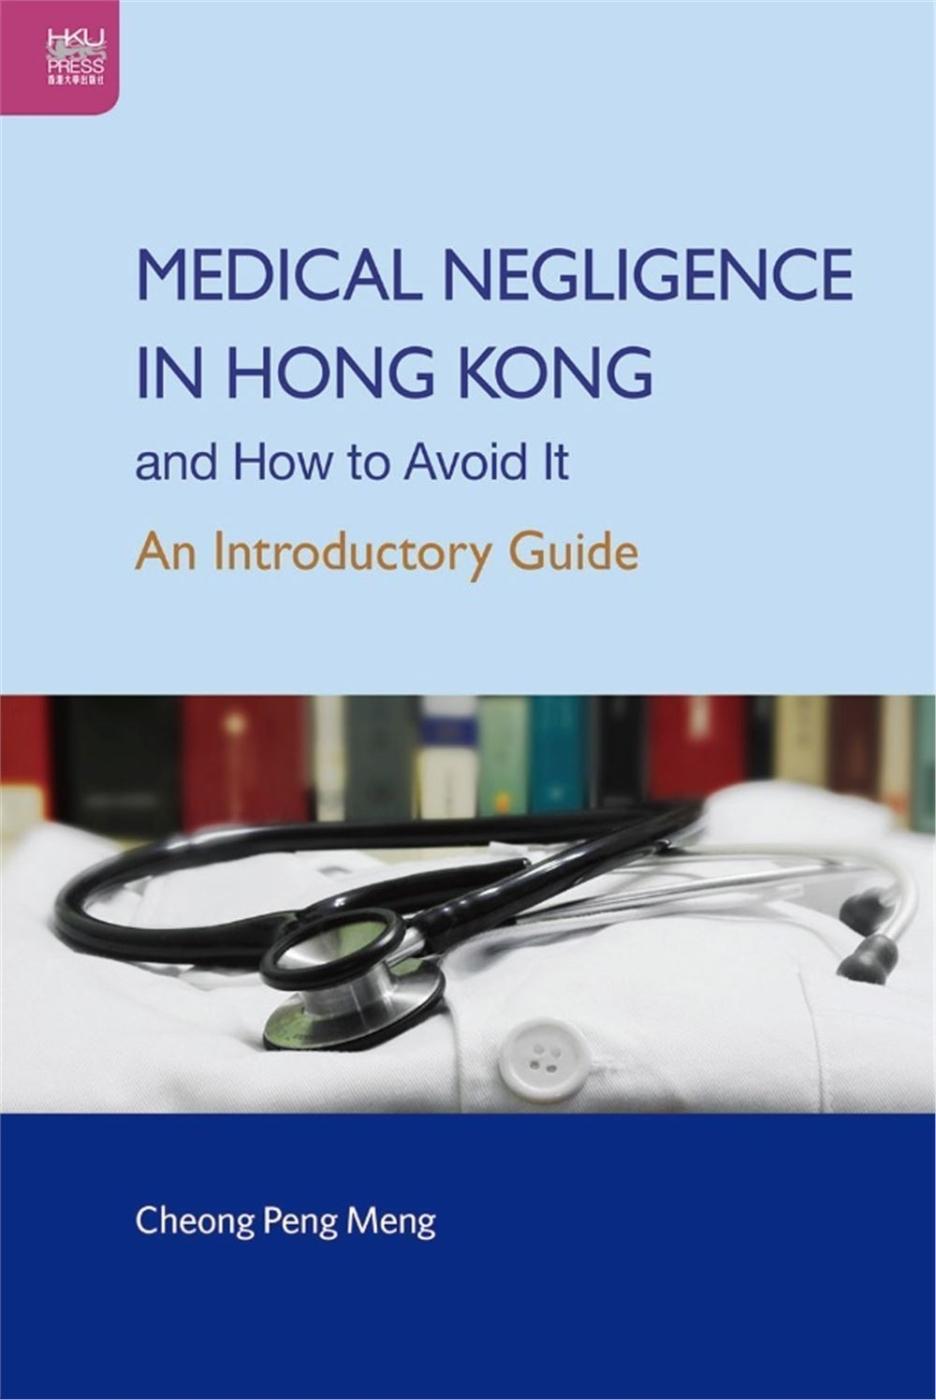 Medical Neglige...